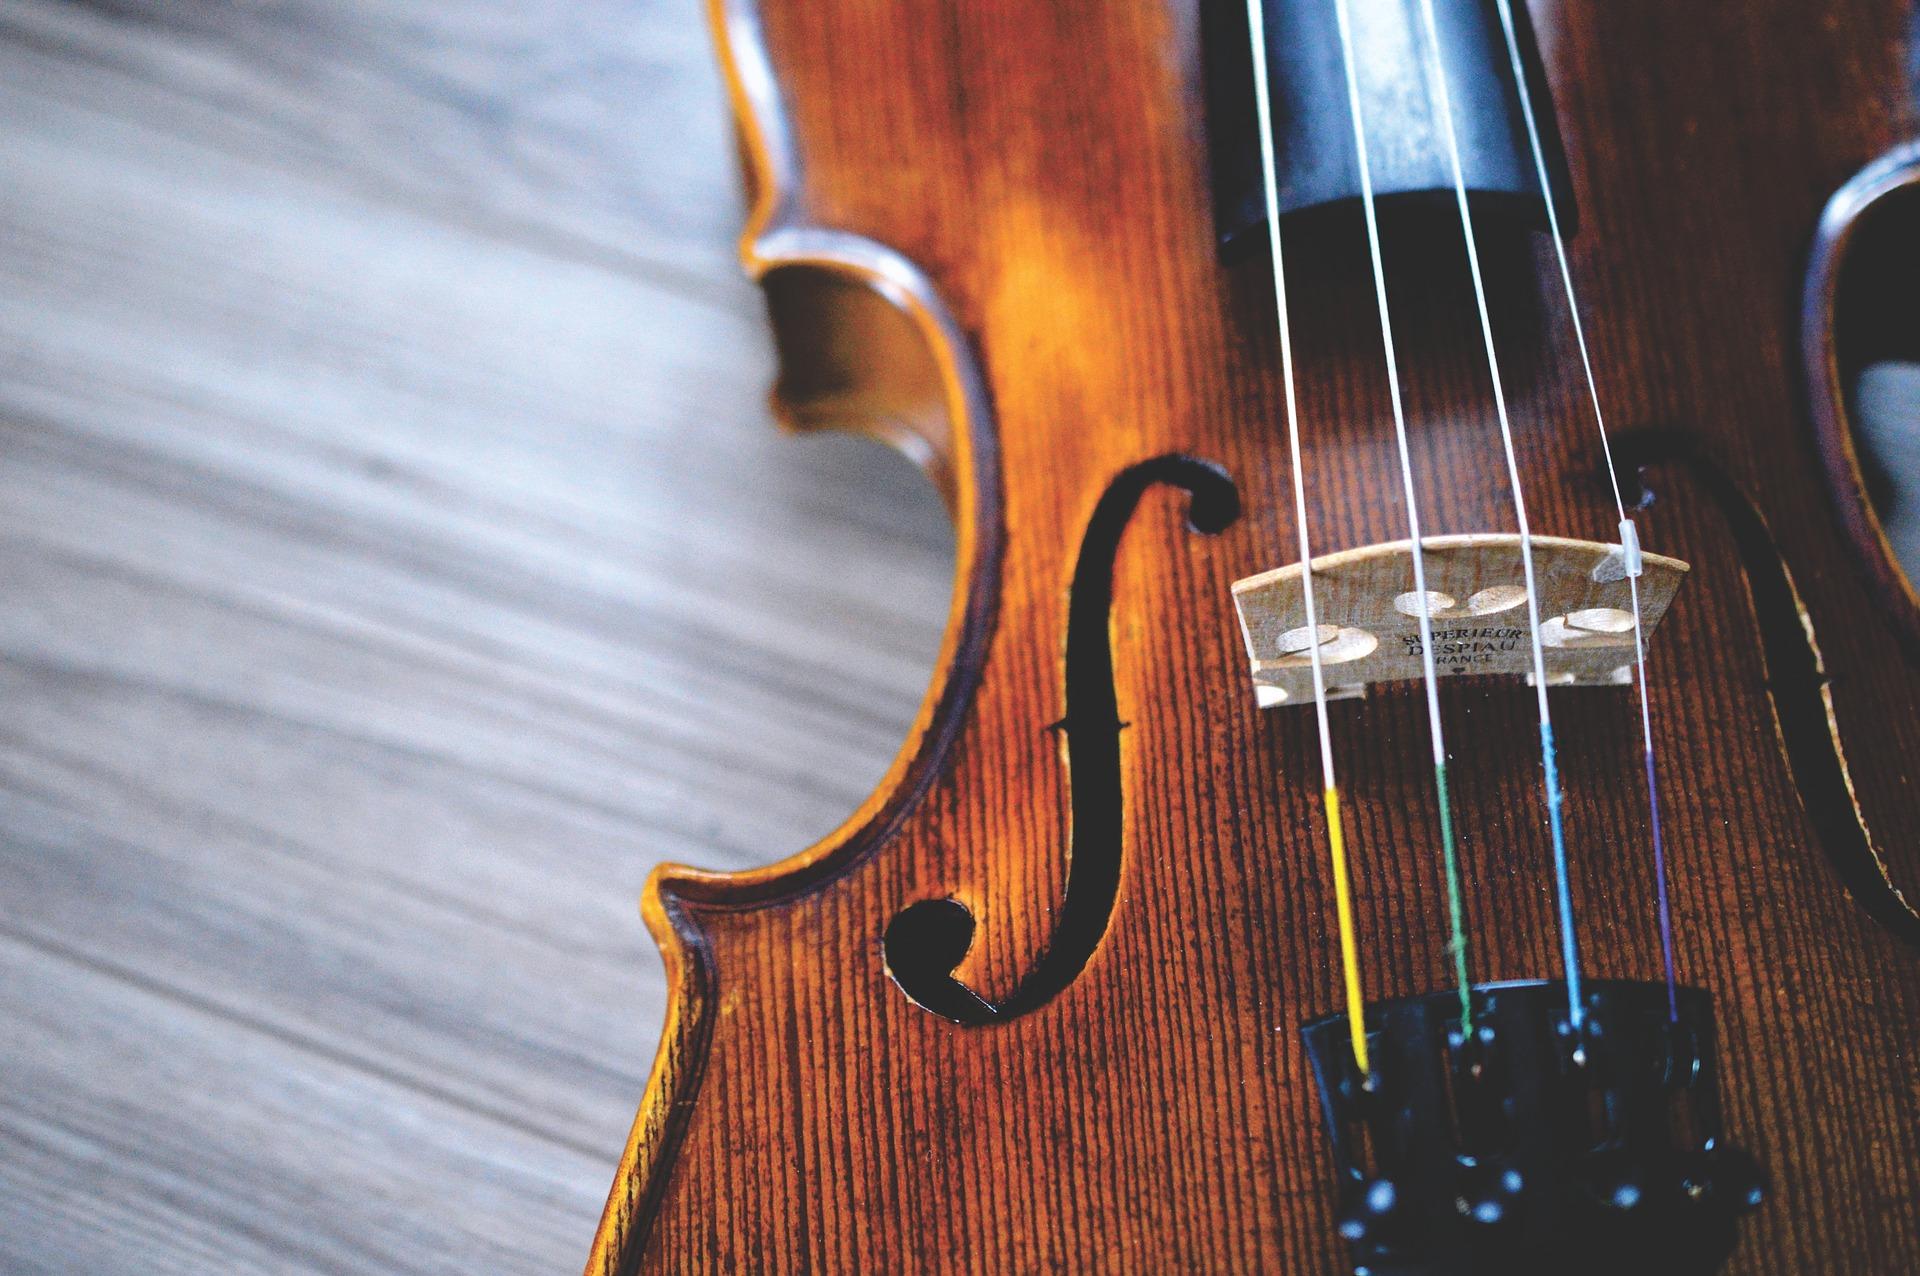 violin-2560312_1920.jpg